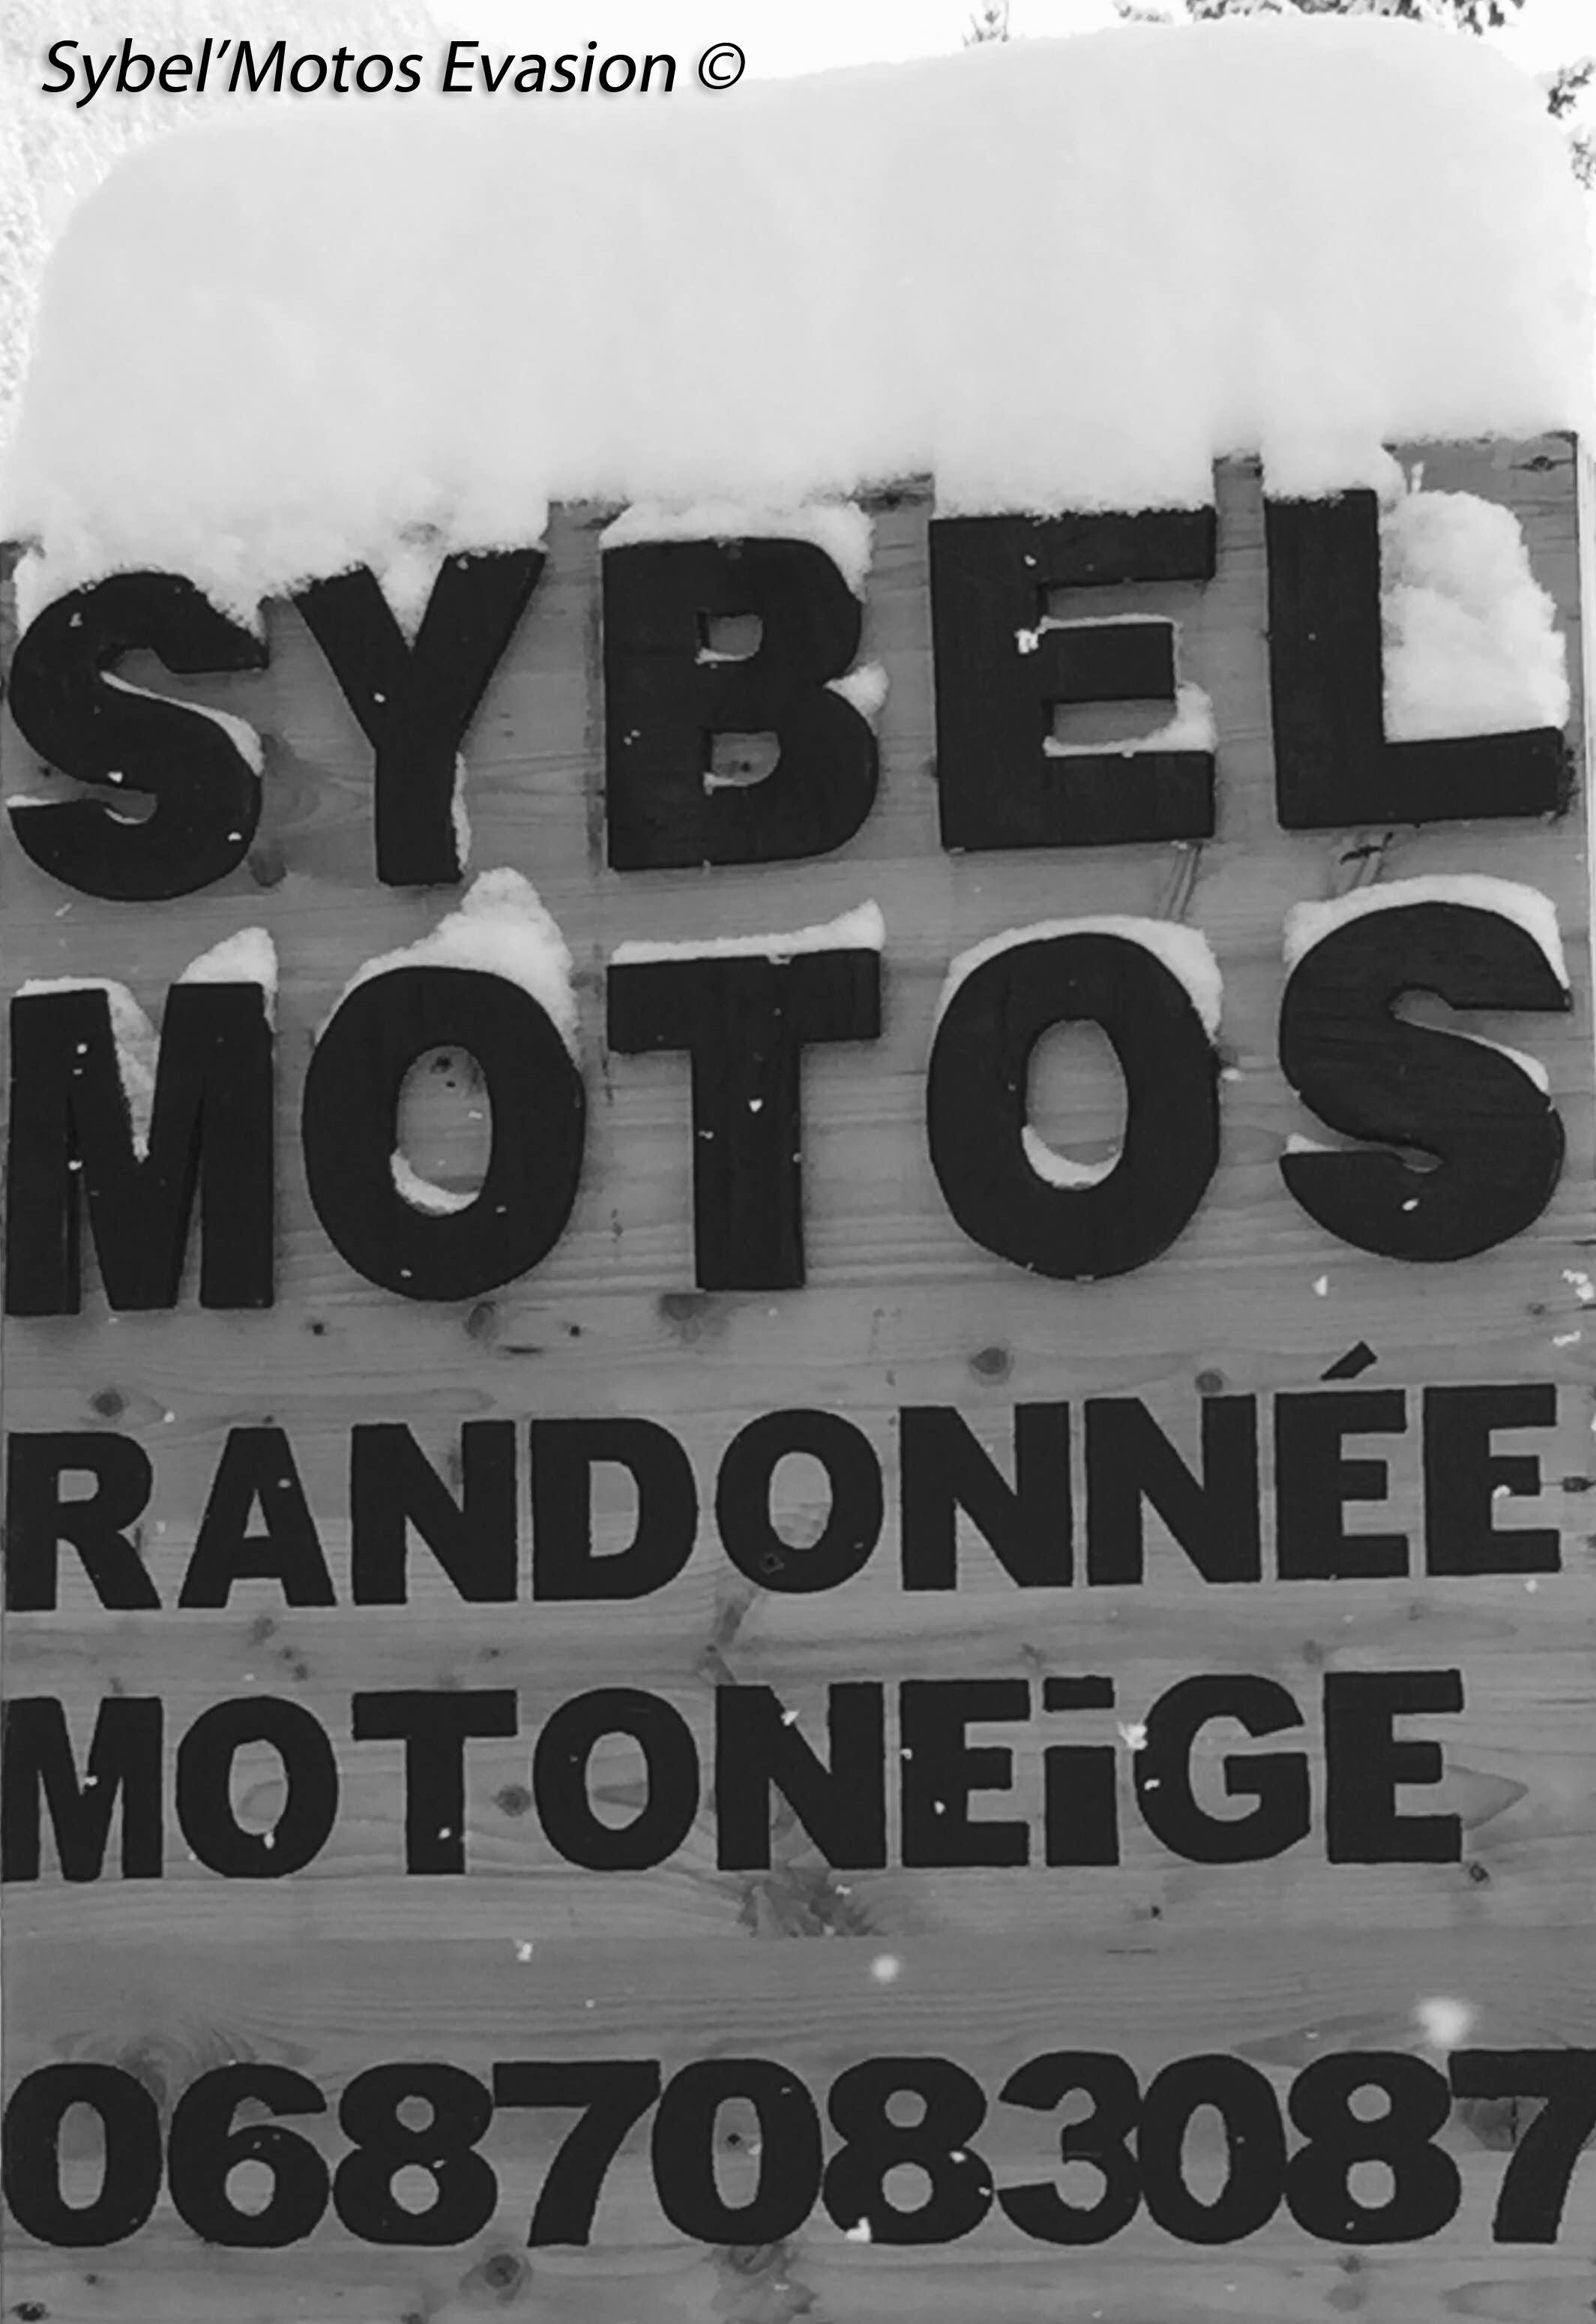 Sybel'Moto Evasion - Saint Sorlin d'Arves - Sybelles © © Sybel'Motos Evasion